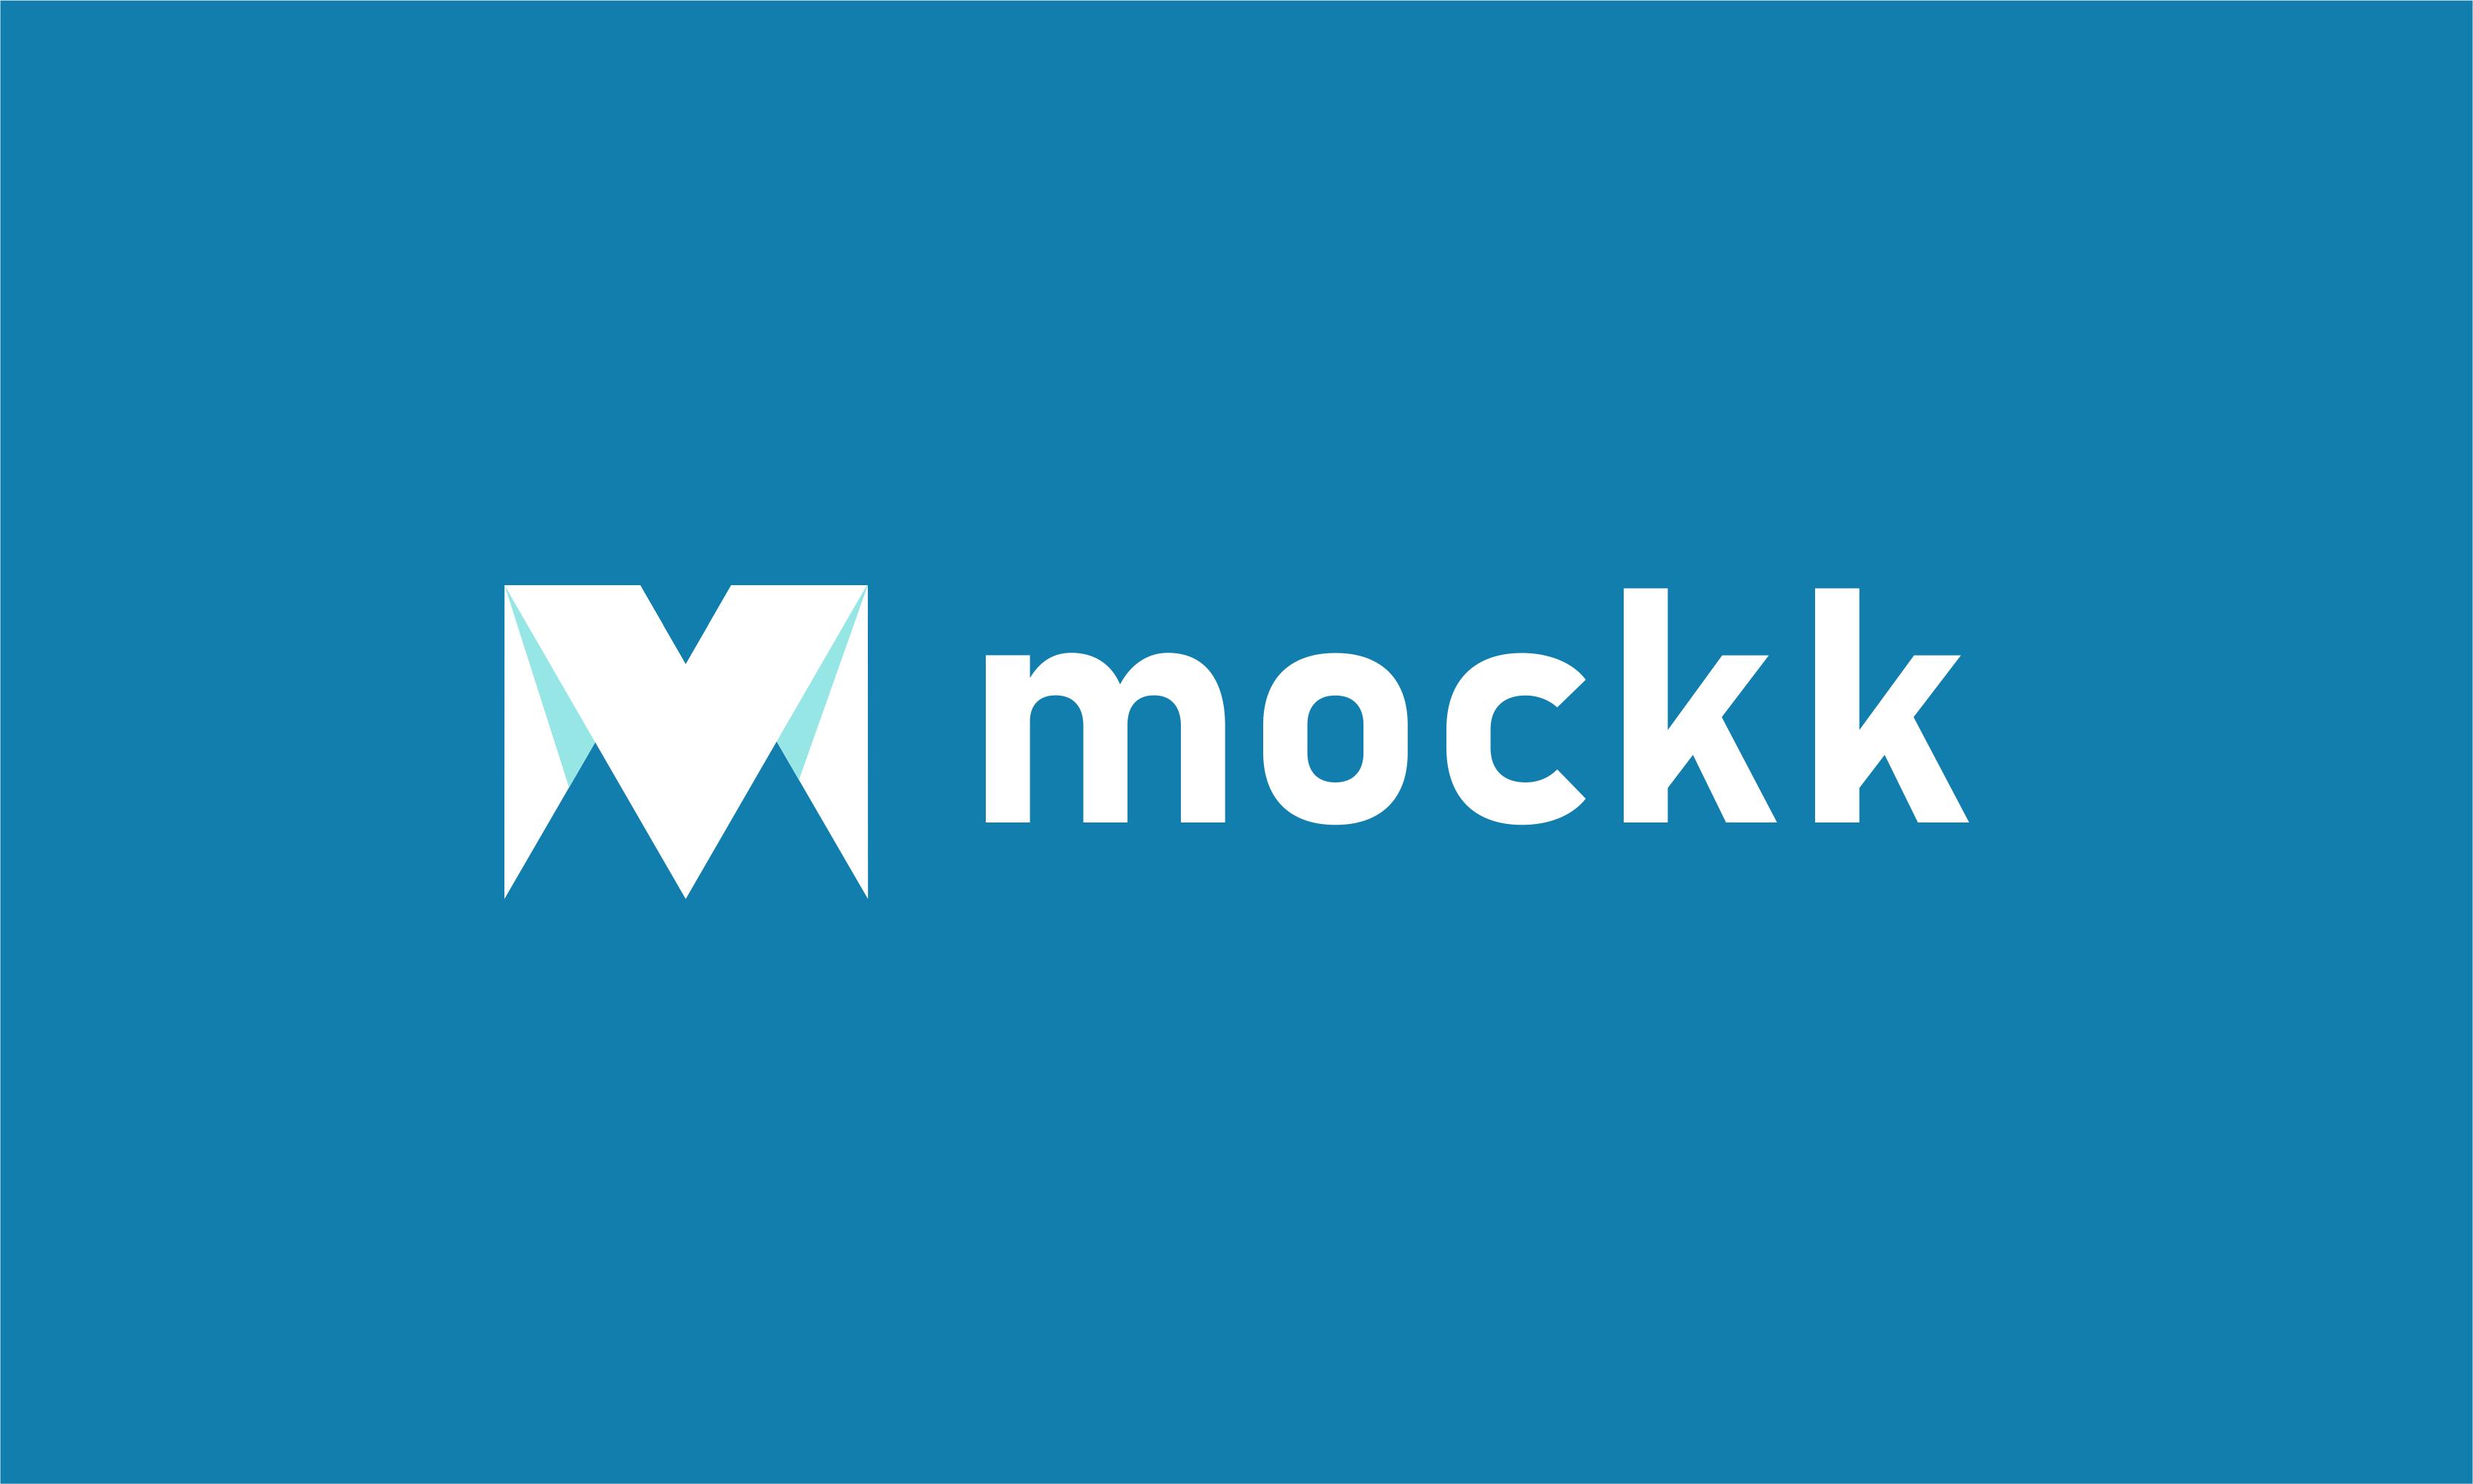 Mockk